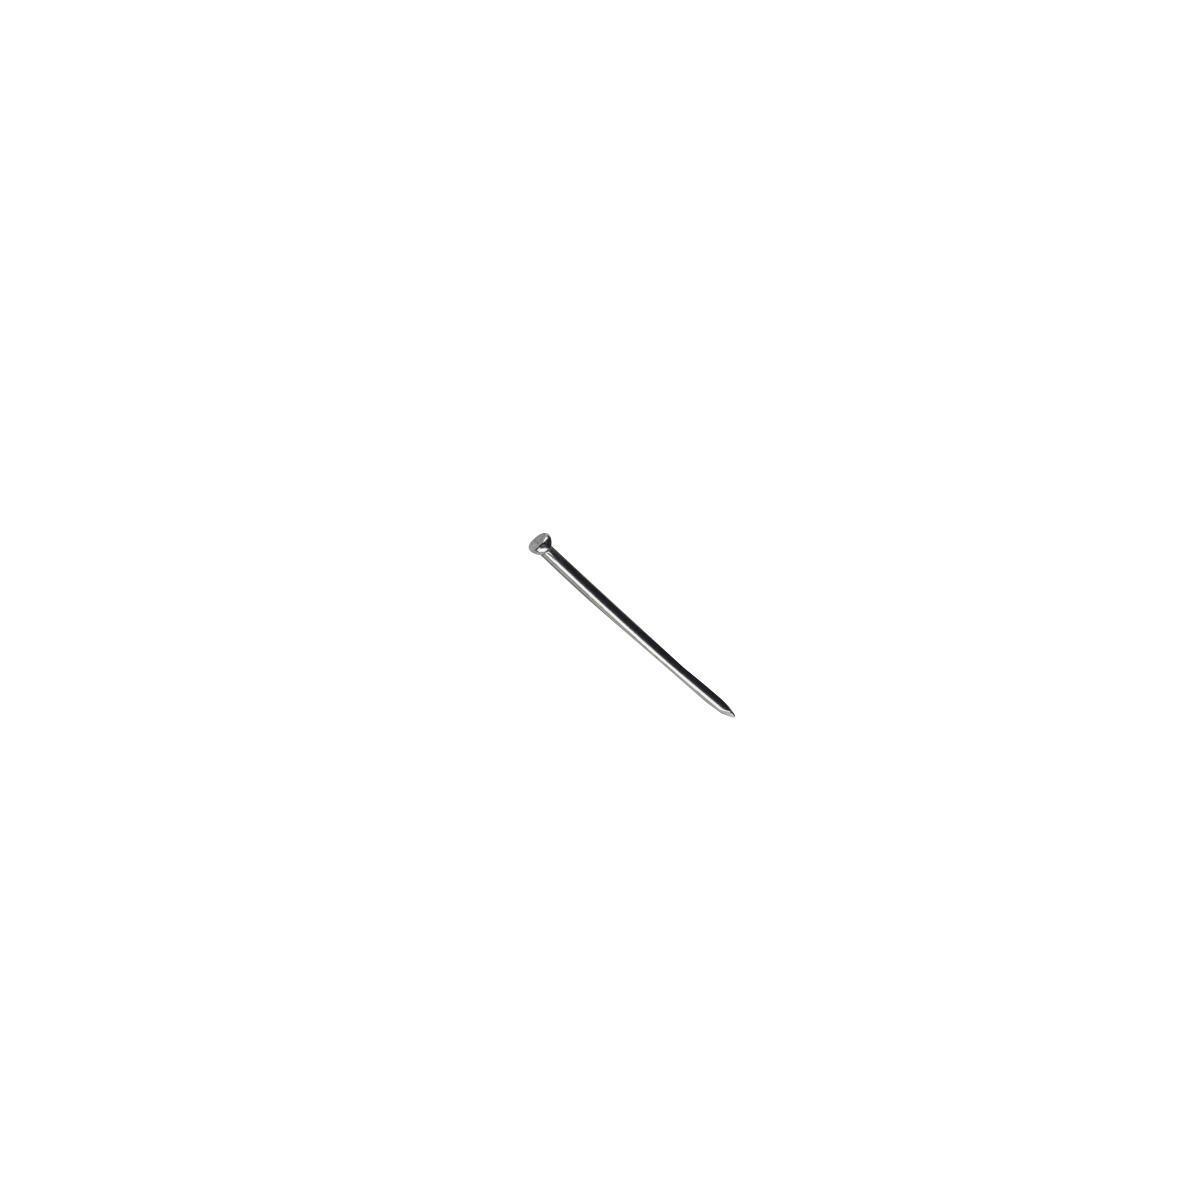 Chiodo testa groppino STANDERS acciaio L 10 mm x Ø 1 mm, 1160 pezzi - 1